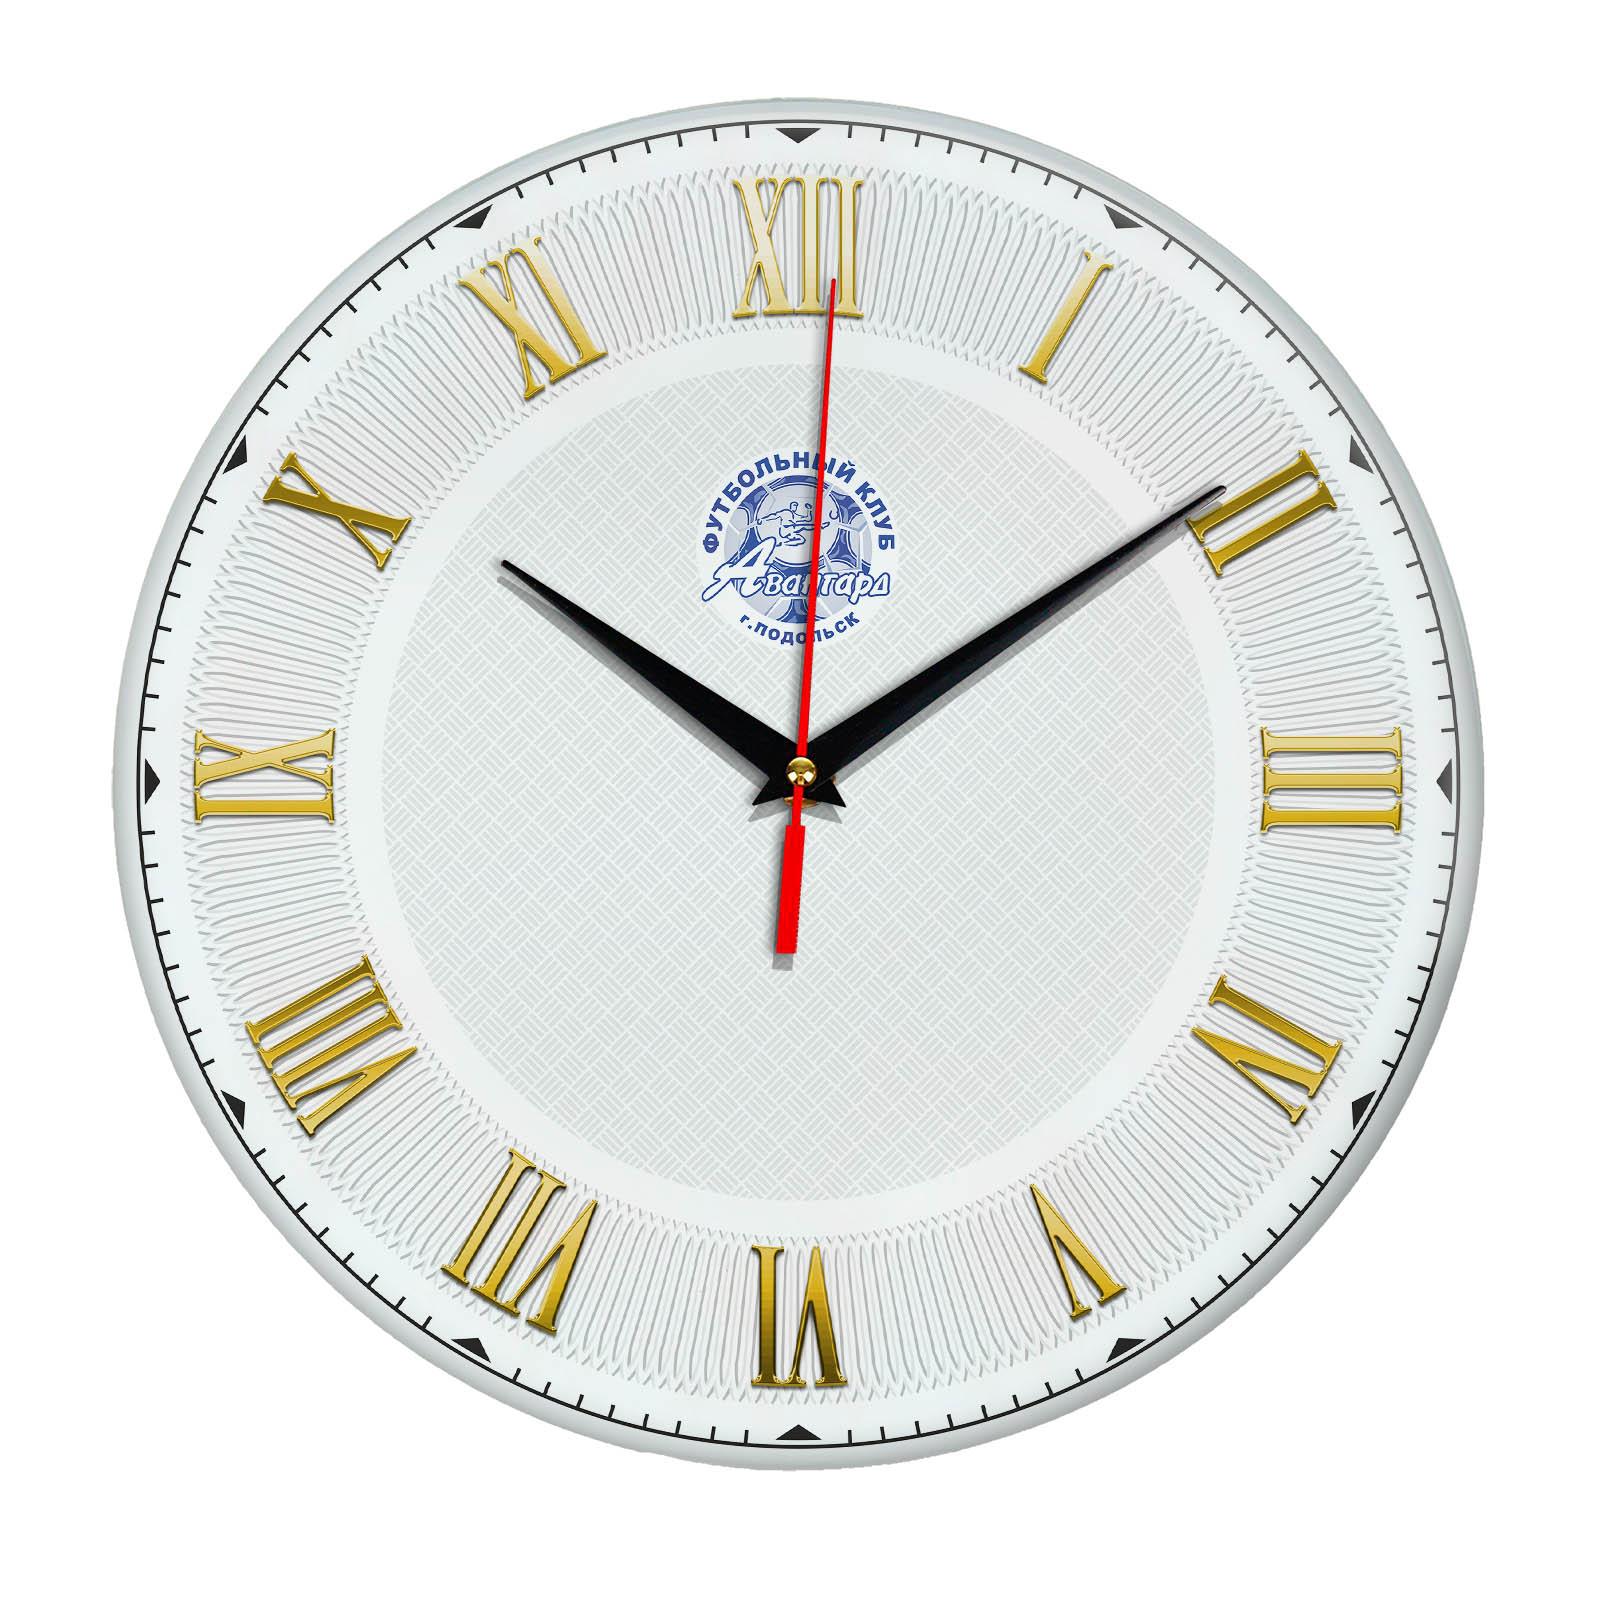 Настенные часы «Футбольный клуб AVANGARD PODOLSK»